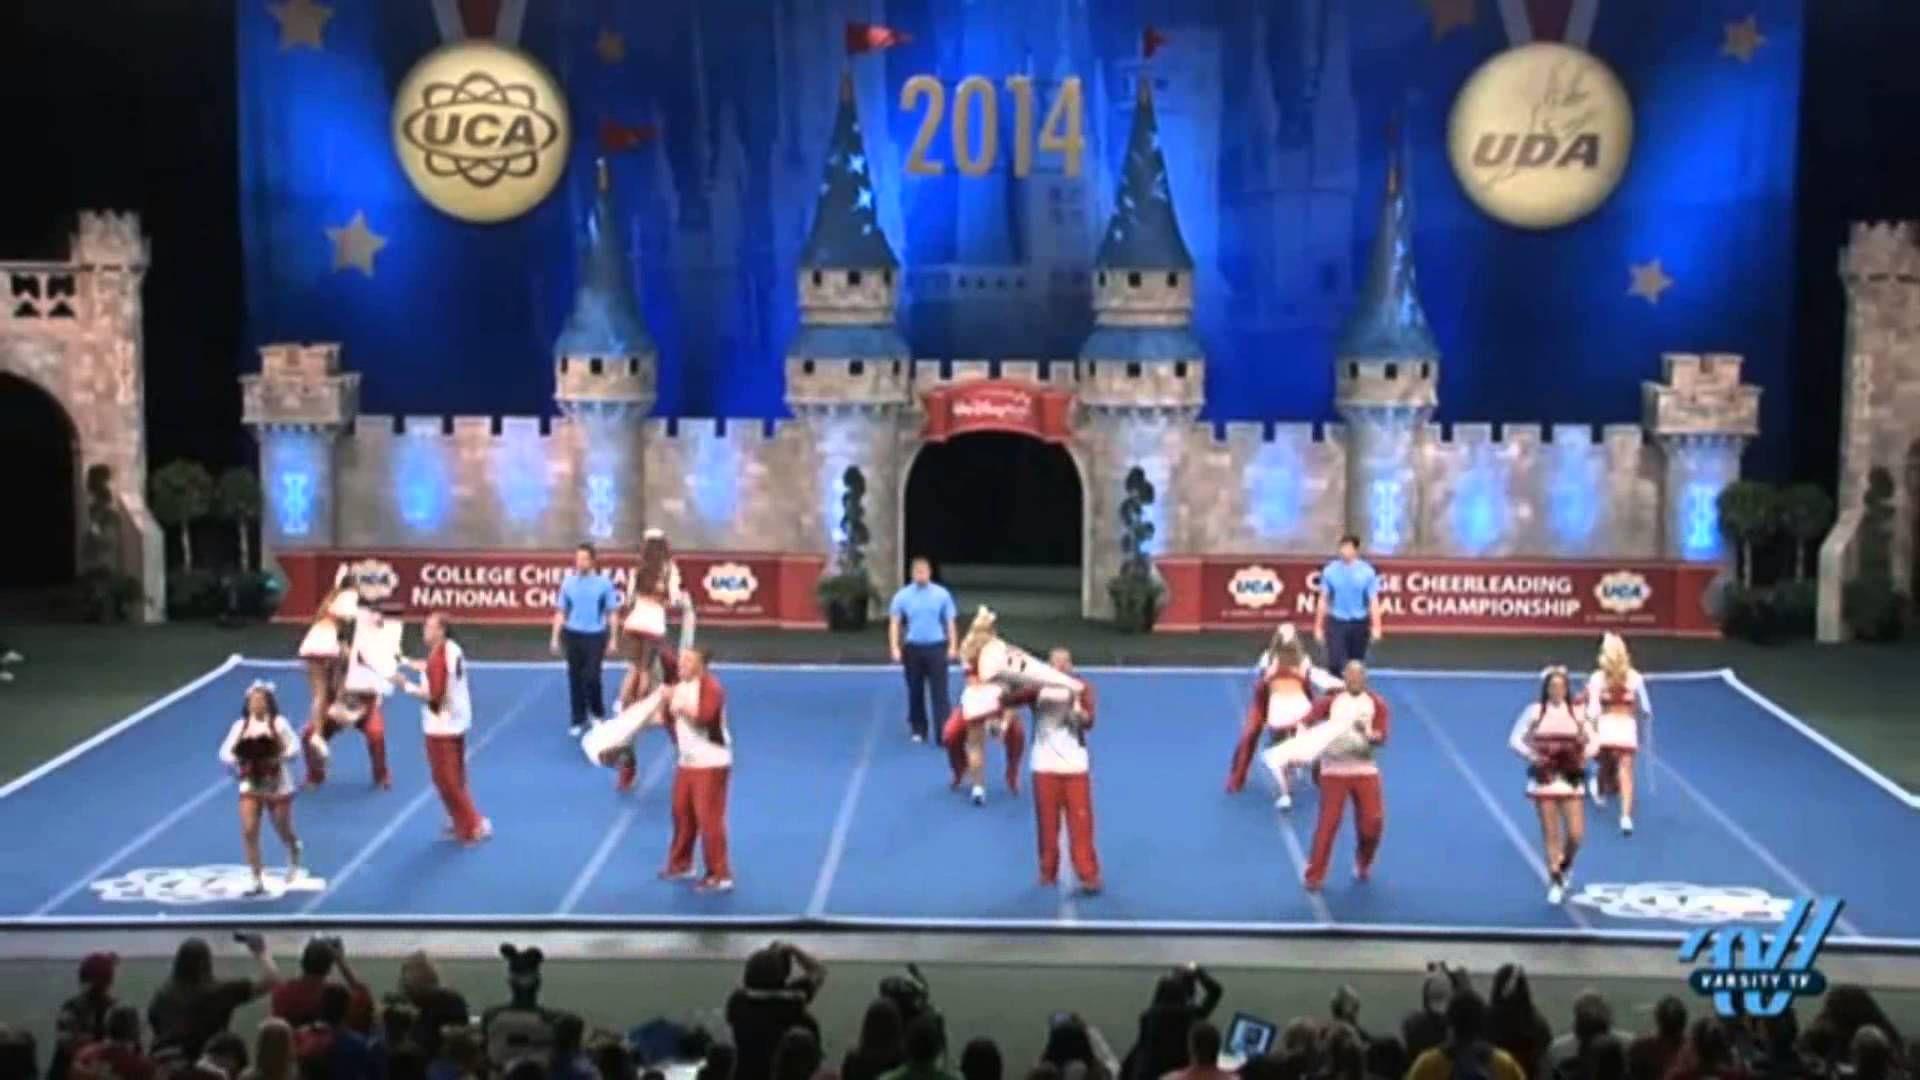 Wsu cheer uca national cheerleading competition 2014